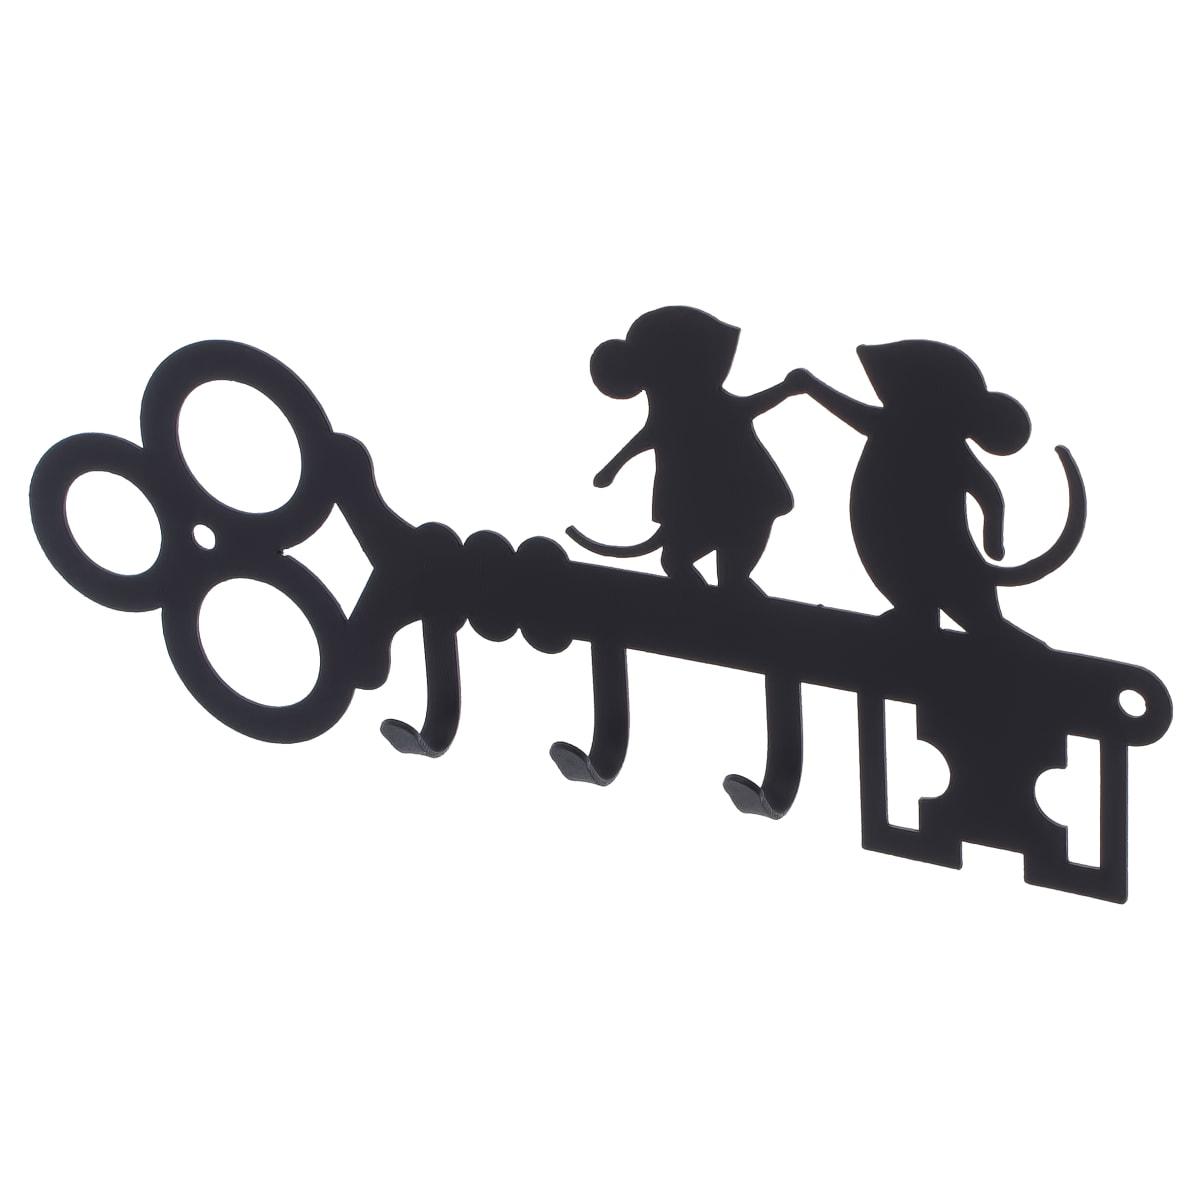 Ключница DuckandDog «Мыши», 190х99х19 мм, сталь, цвет чёрный матовый